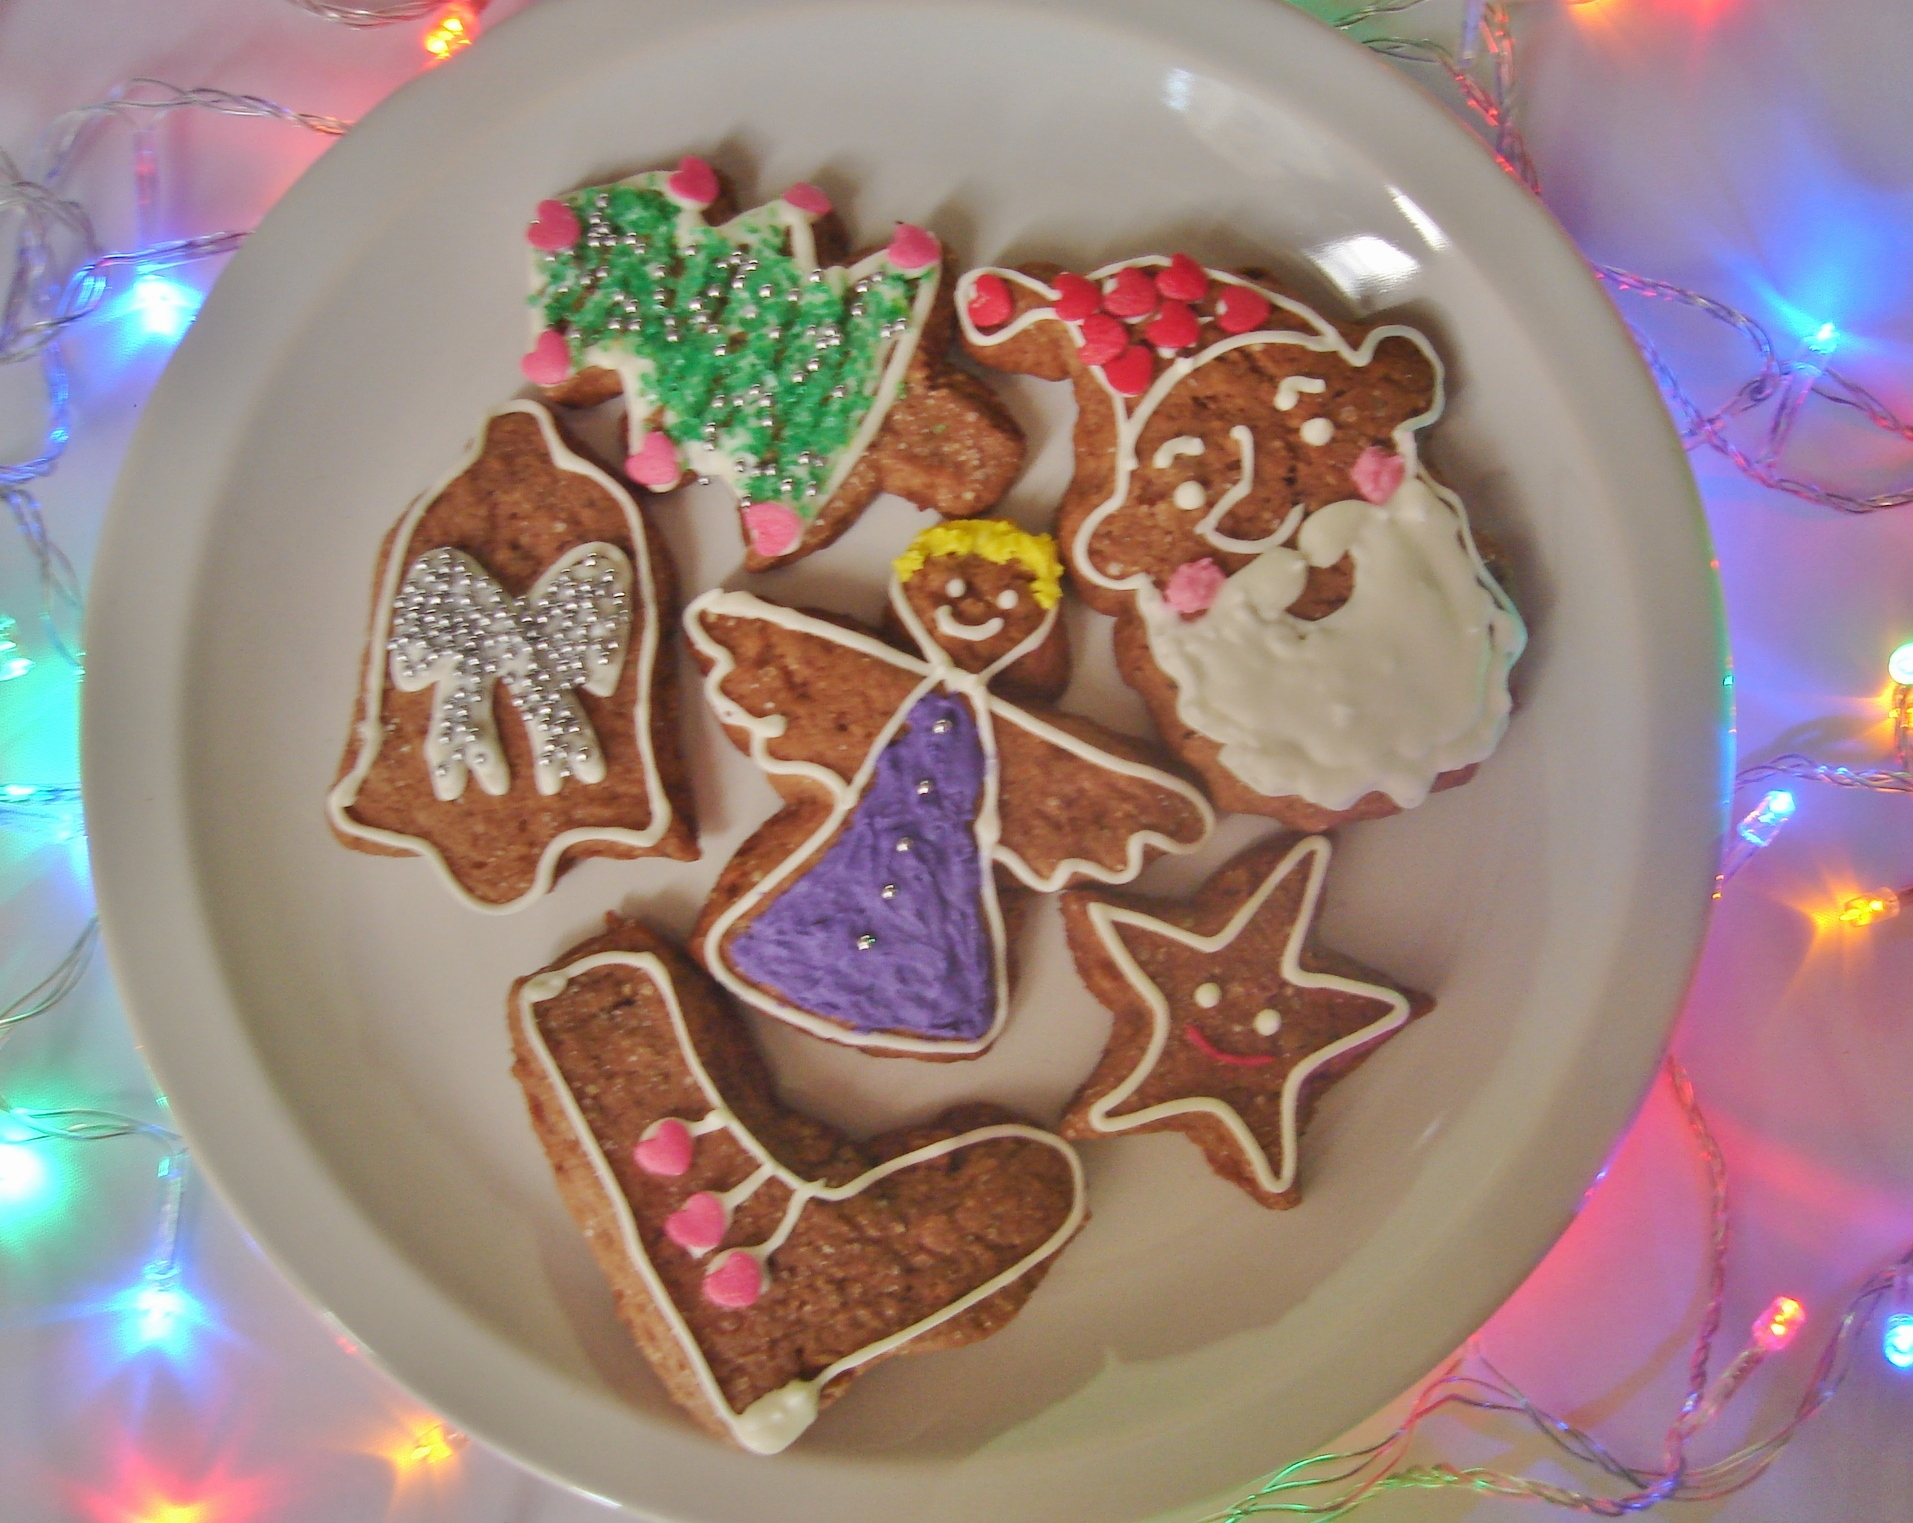 Biscoitos de Natal (Lebkuchen)